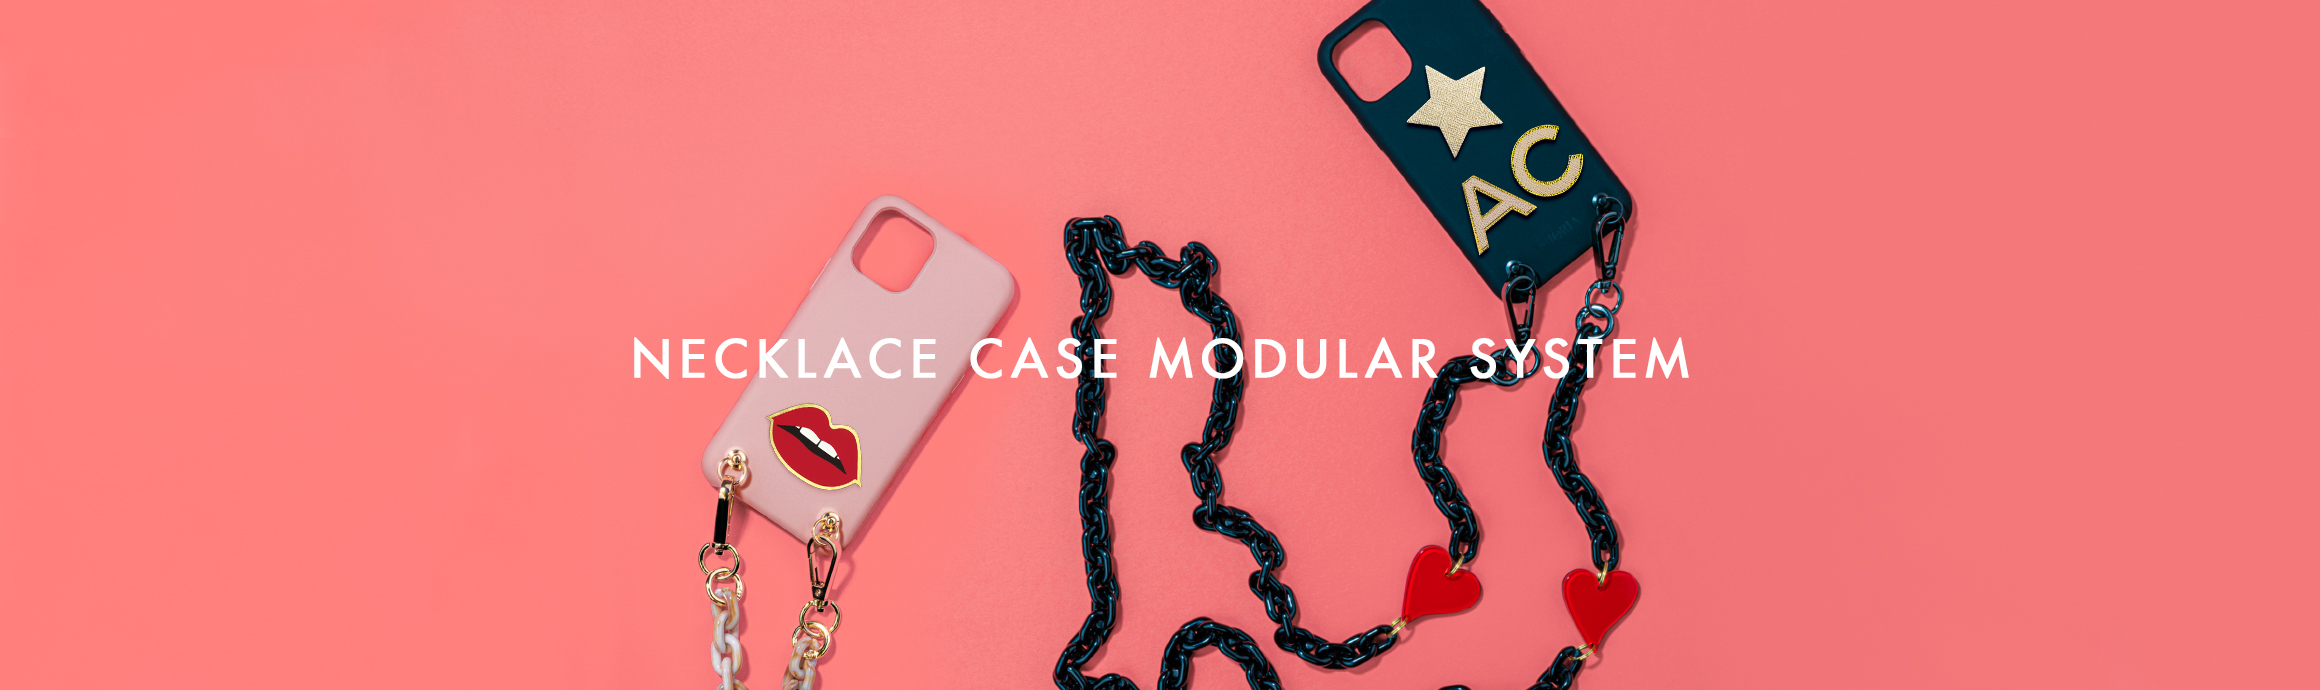 Necklace Modular